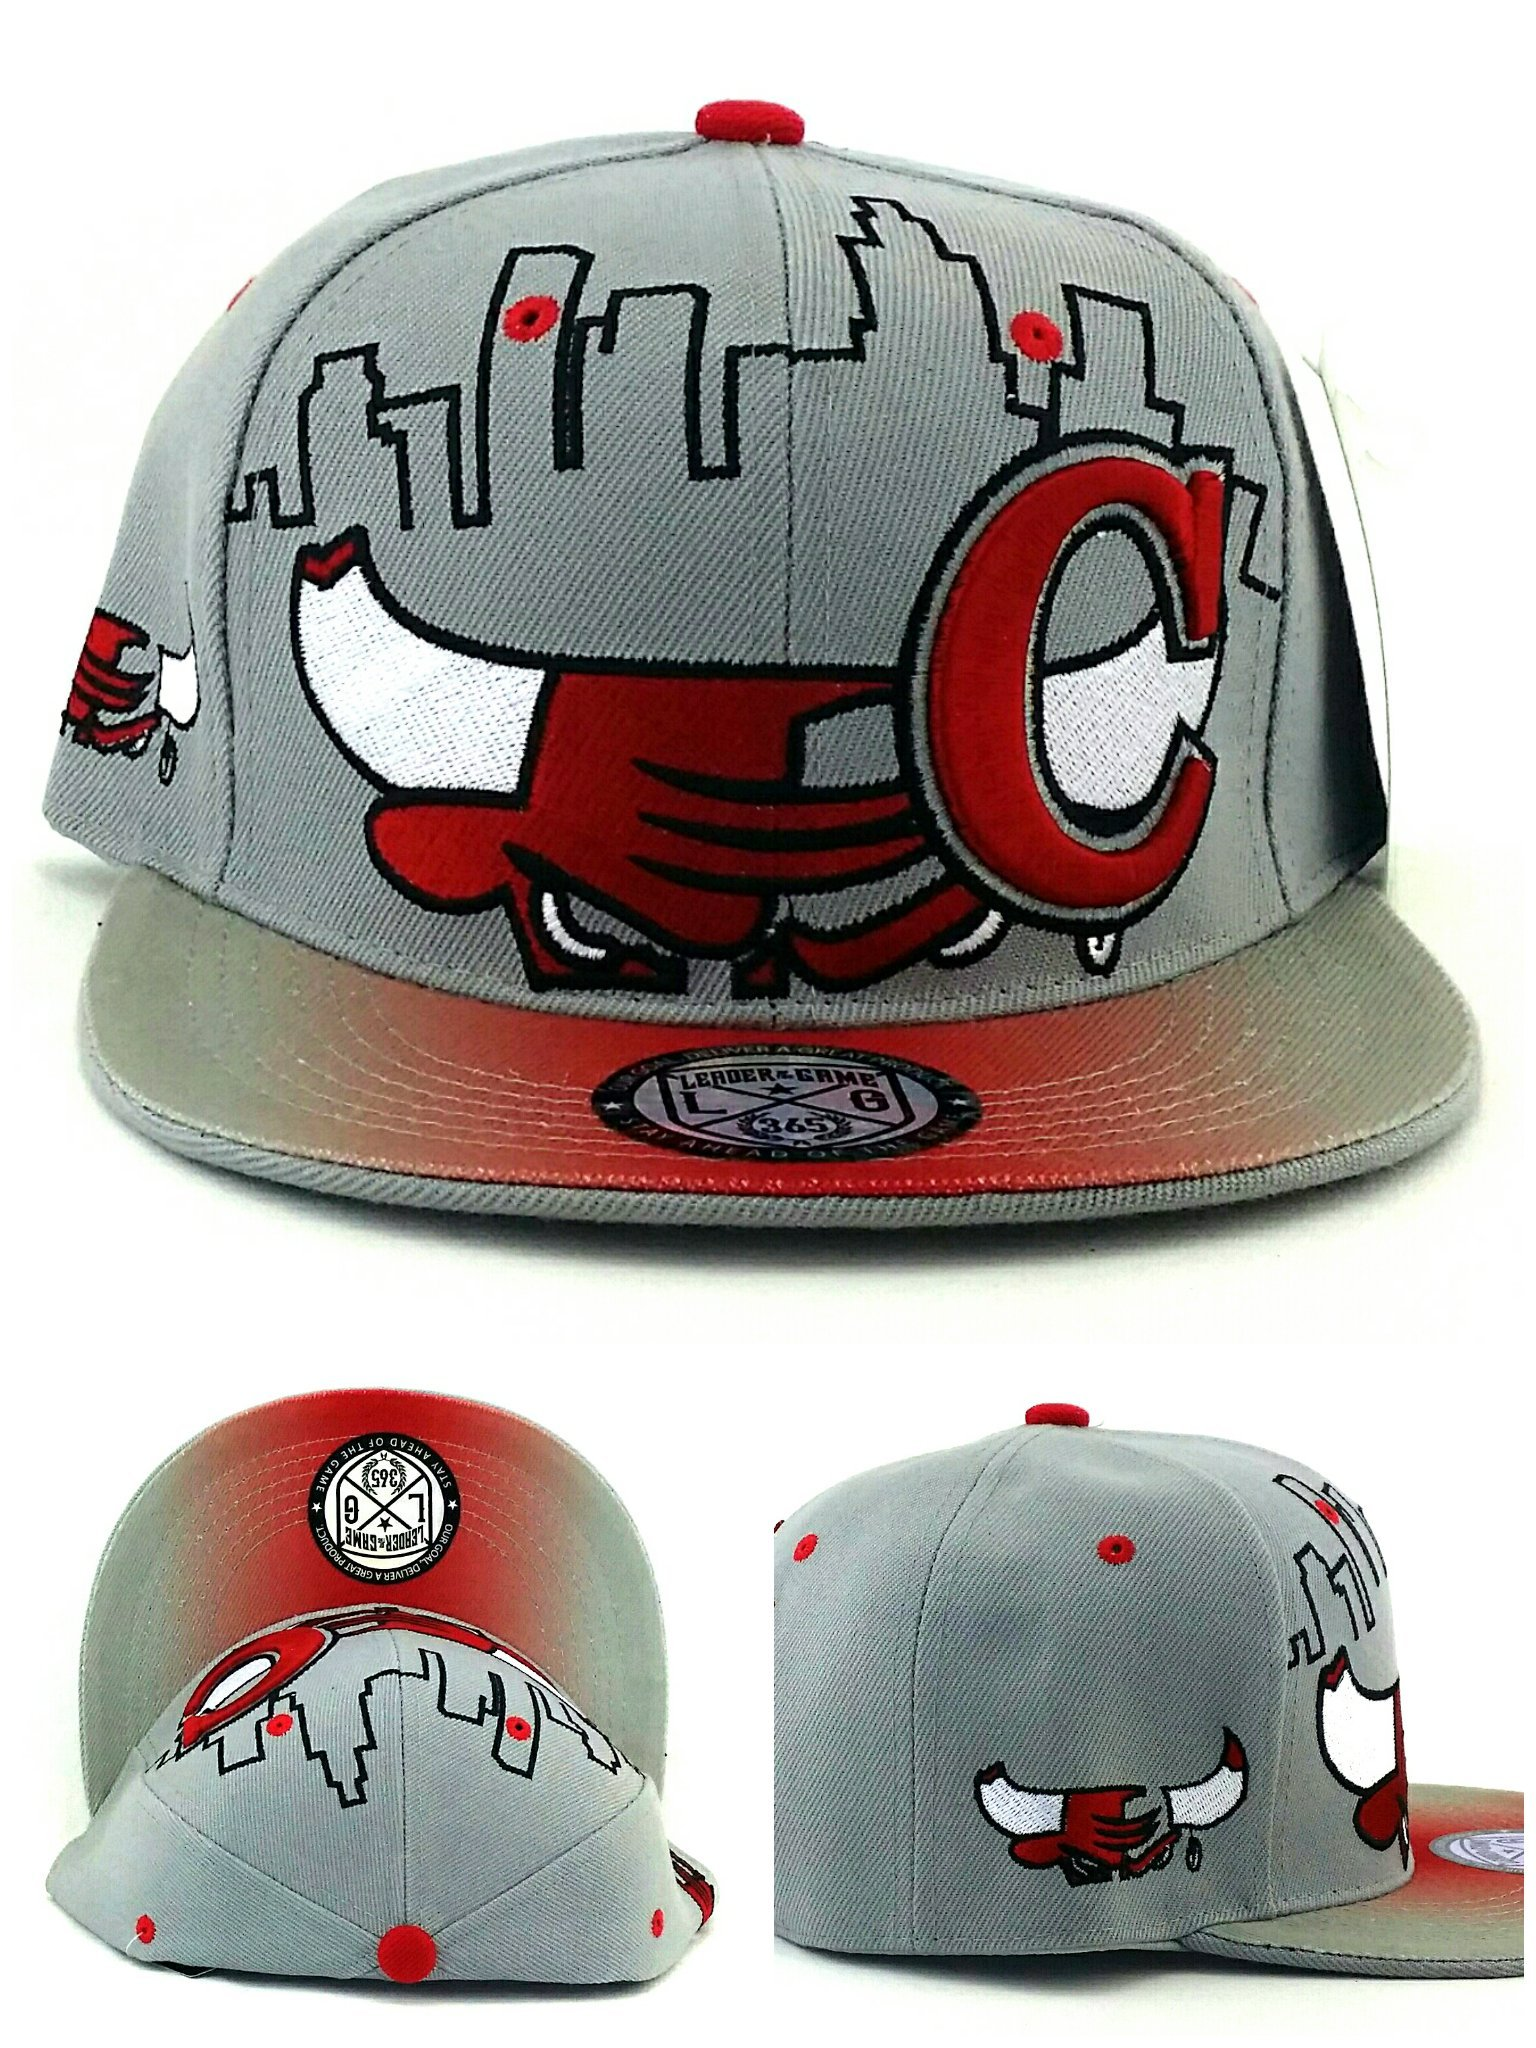 Chicago New Leader Bull Head Skyline Bulls Colors Gray Red Era Snapback Hat Cap